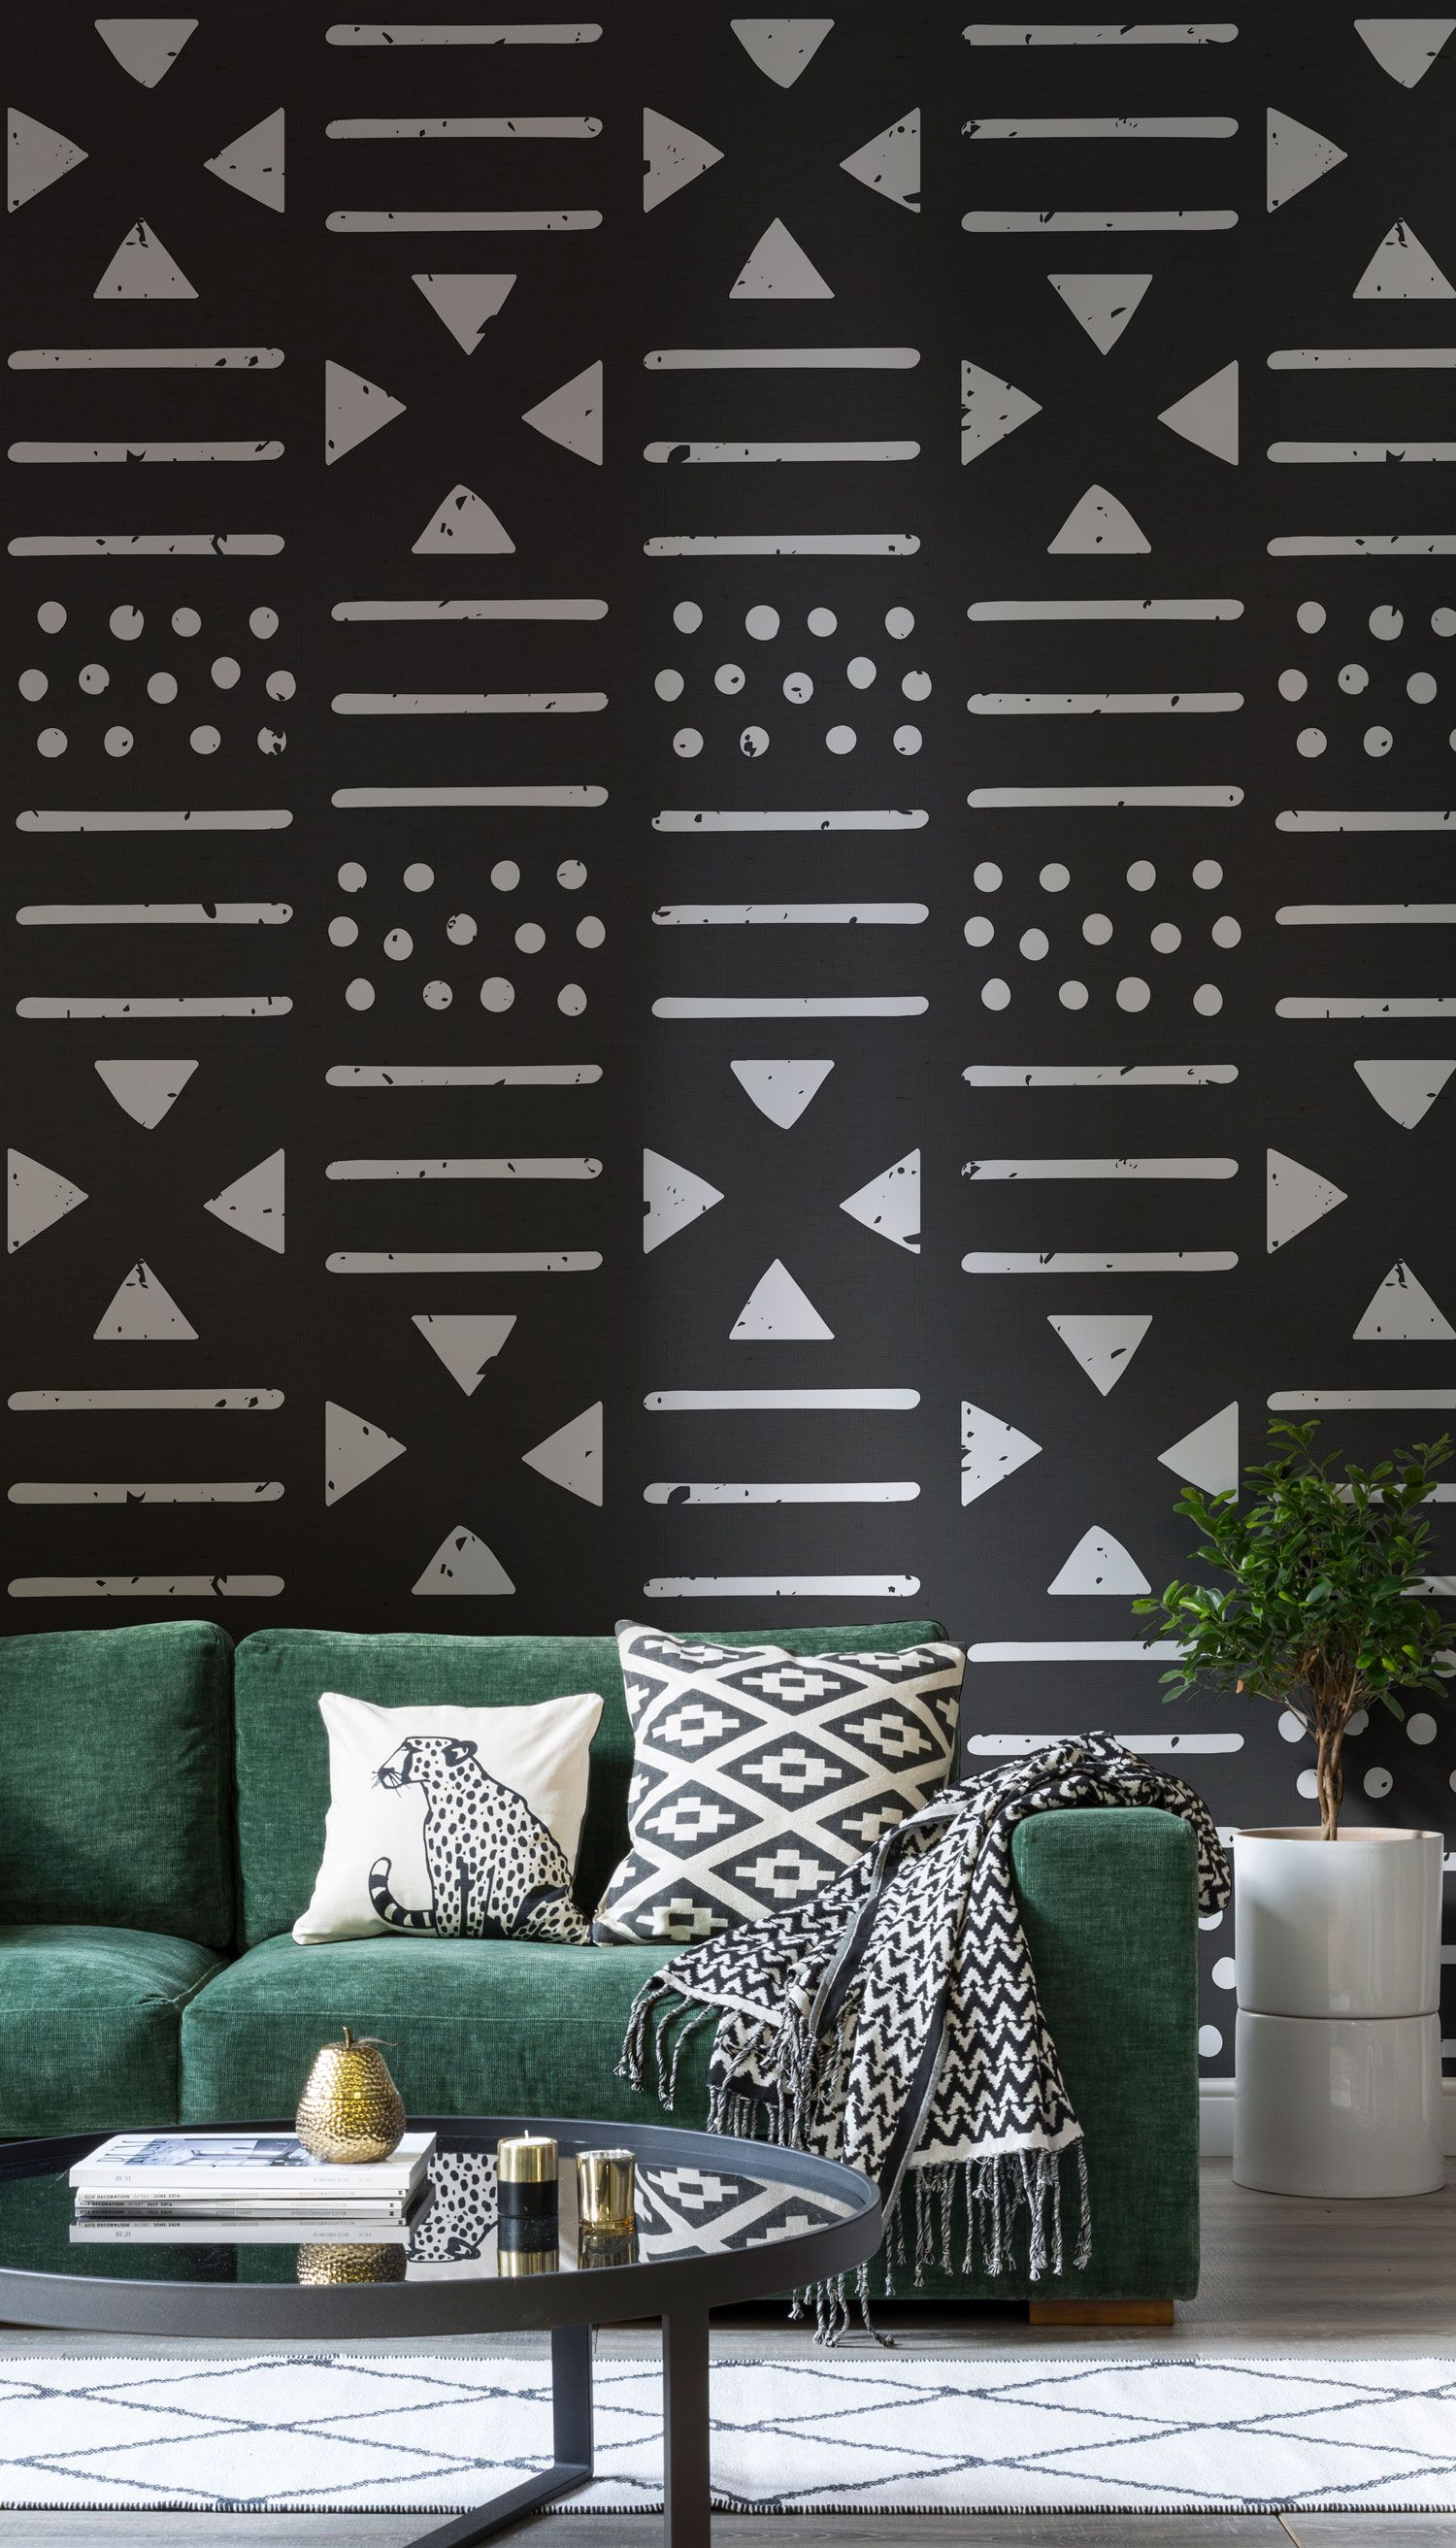 Black and White Tribal Pattern Wallpaper